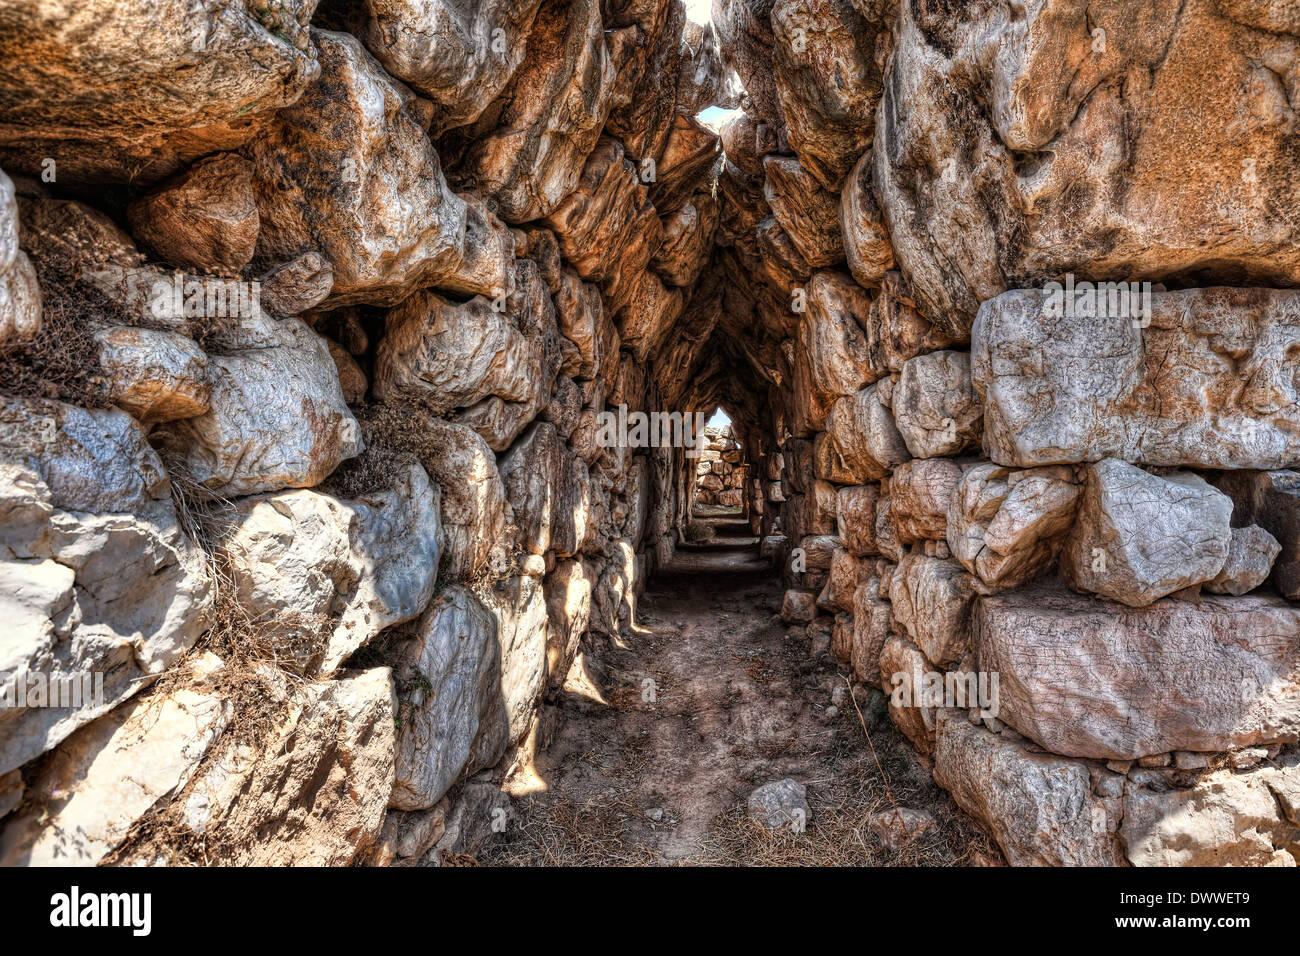 The Cyclopean Walls in Tiryns (1.400 - 1.200 B.C.), Greece - Stock Image